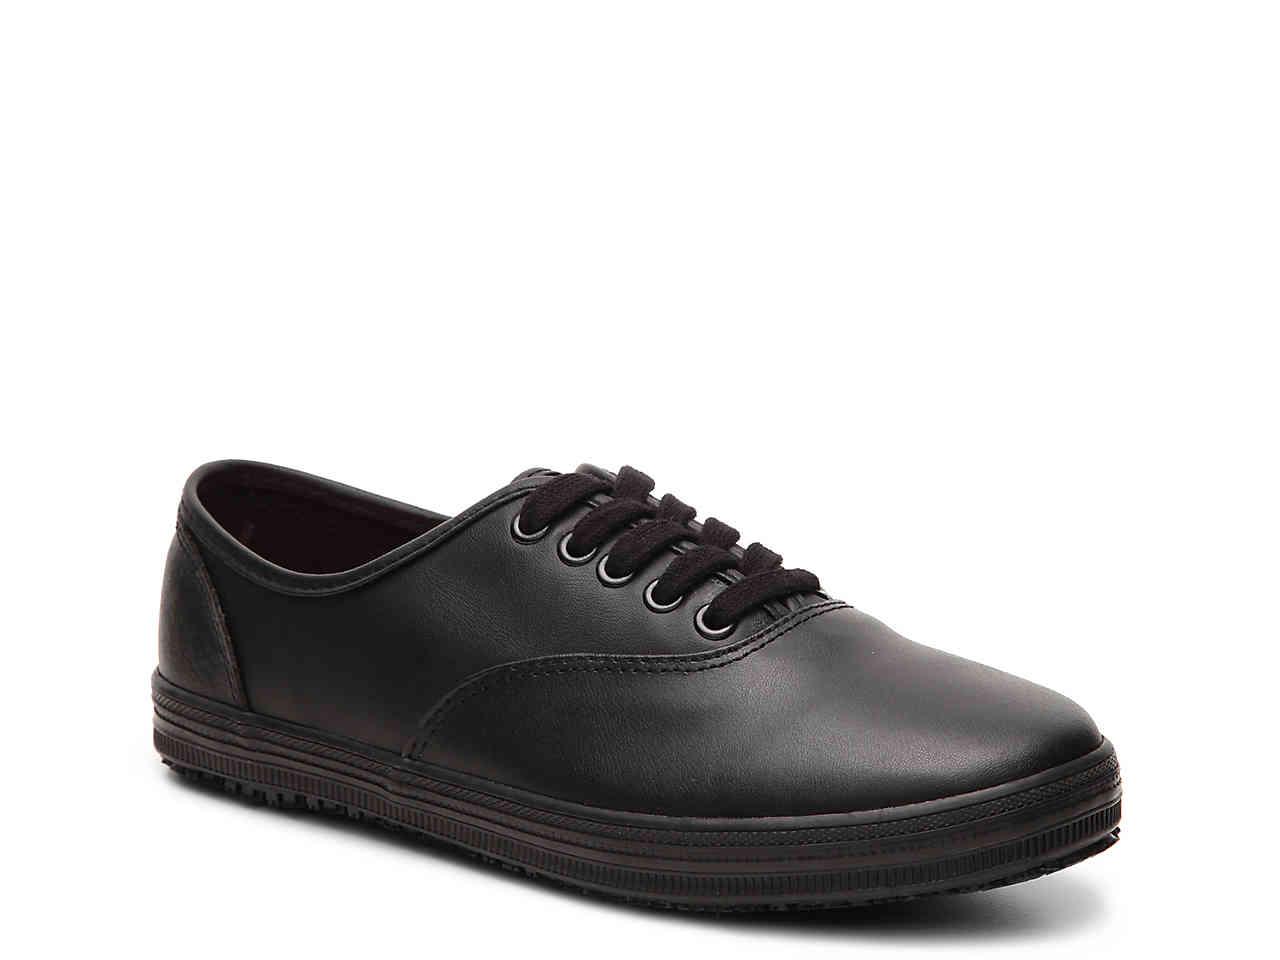 Laforst Sassy Non Slip Work shoe - The